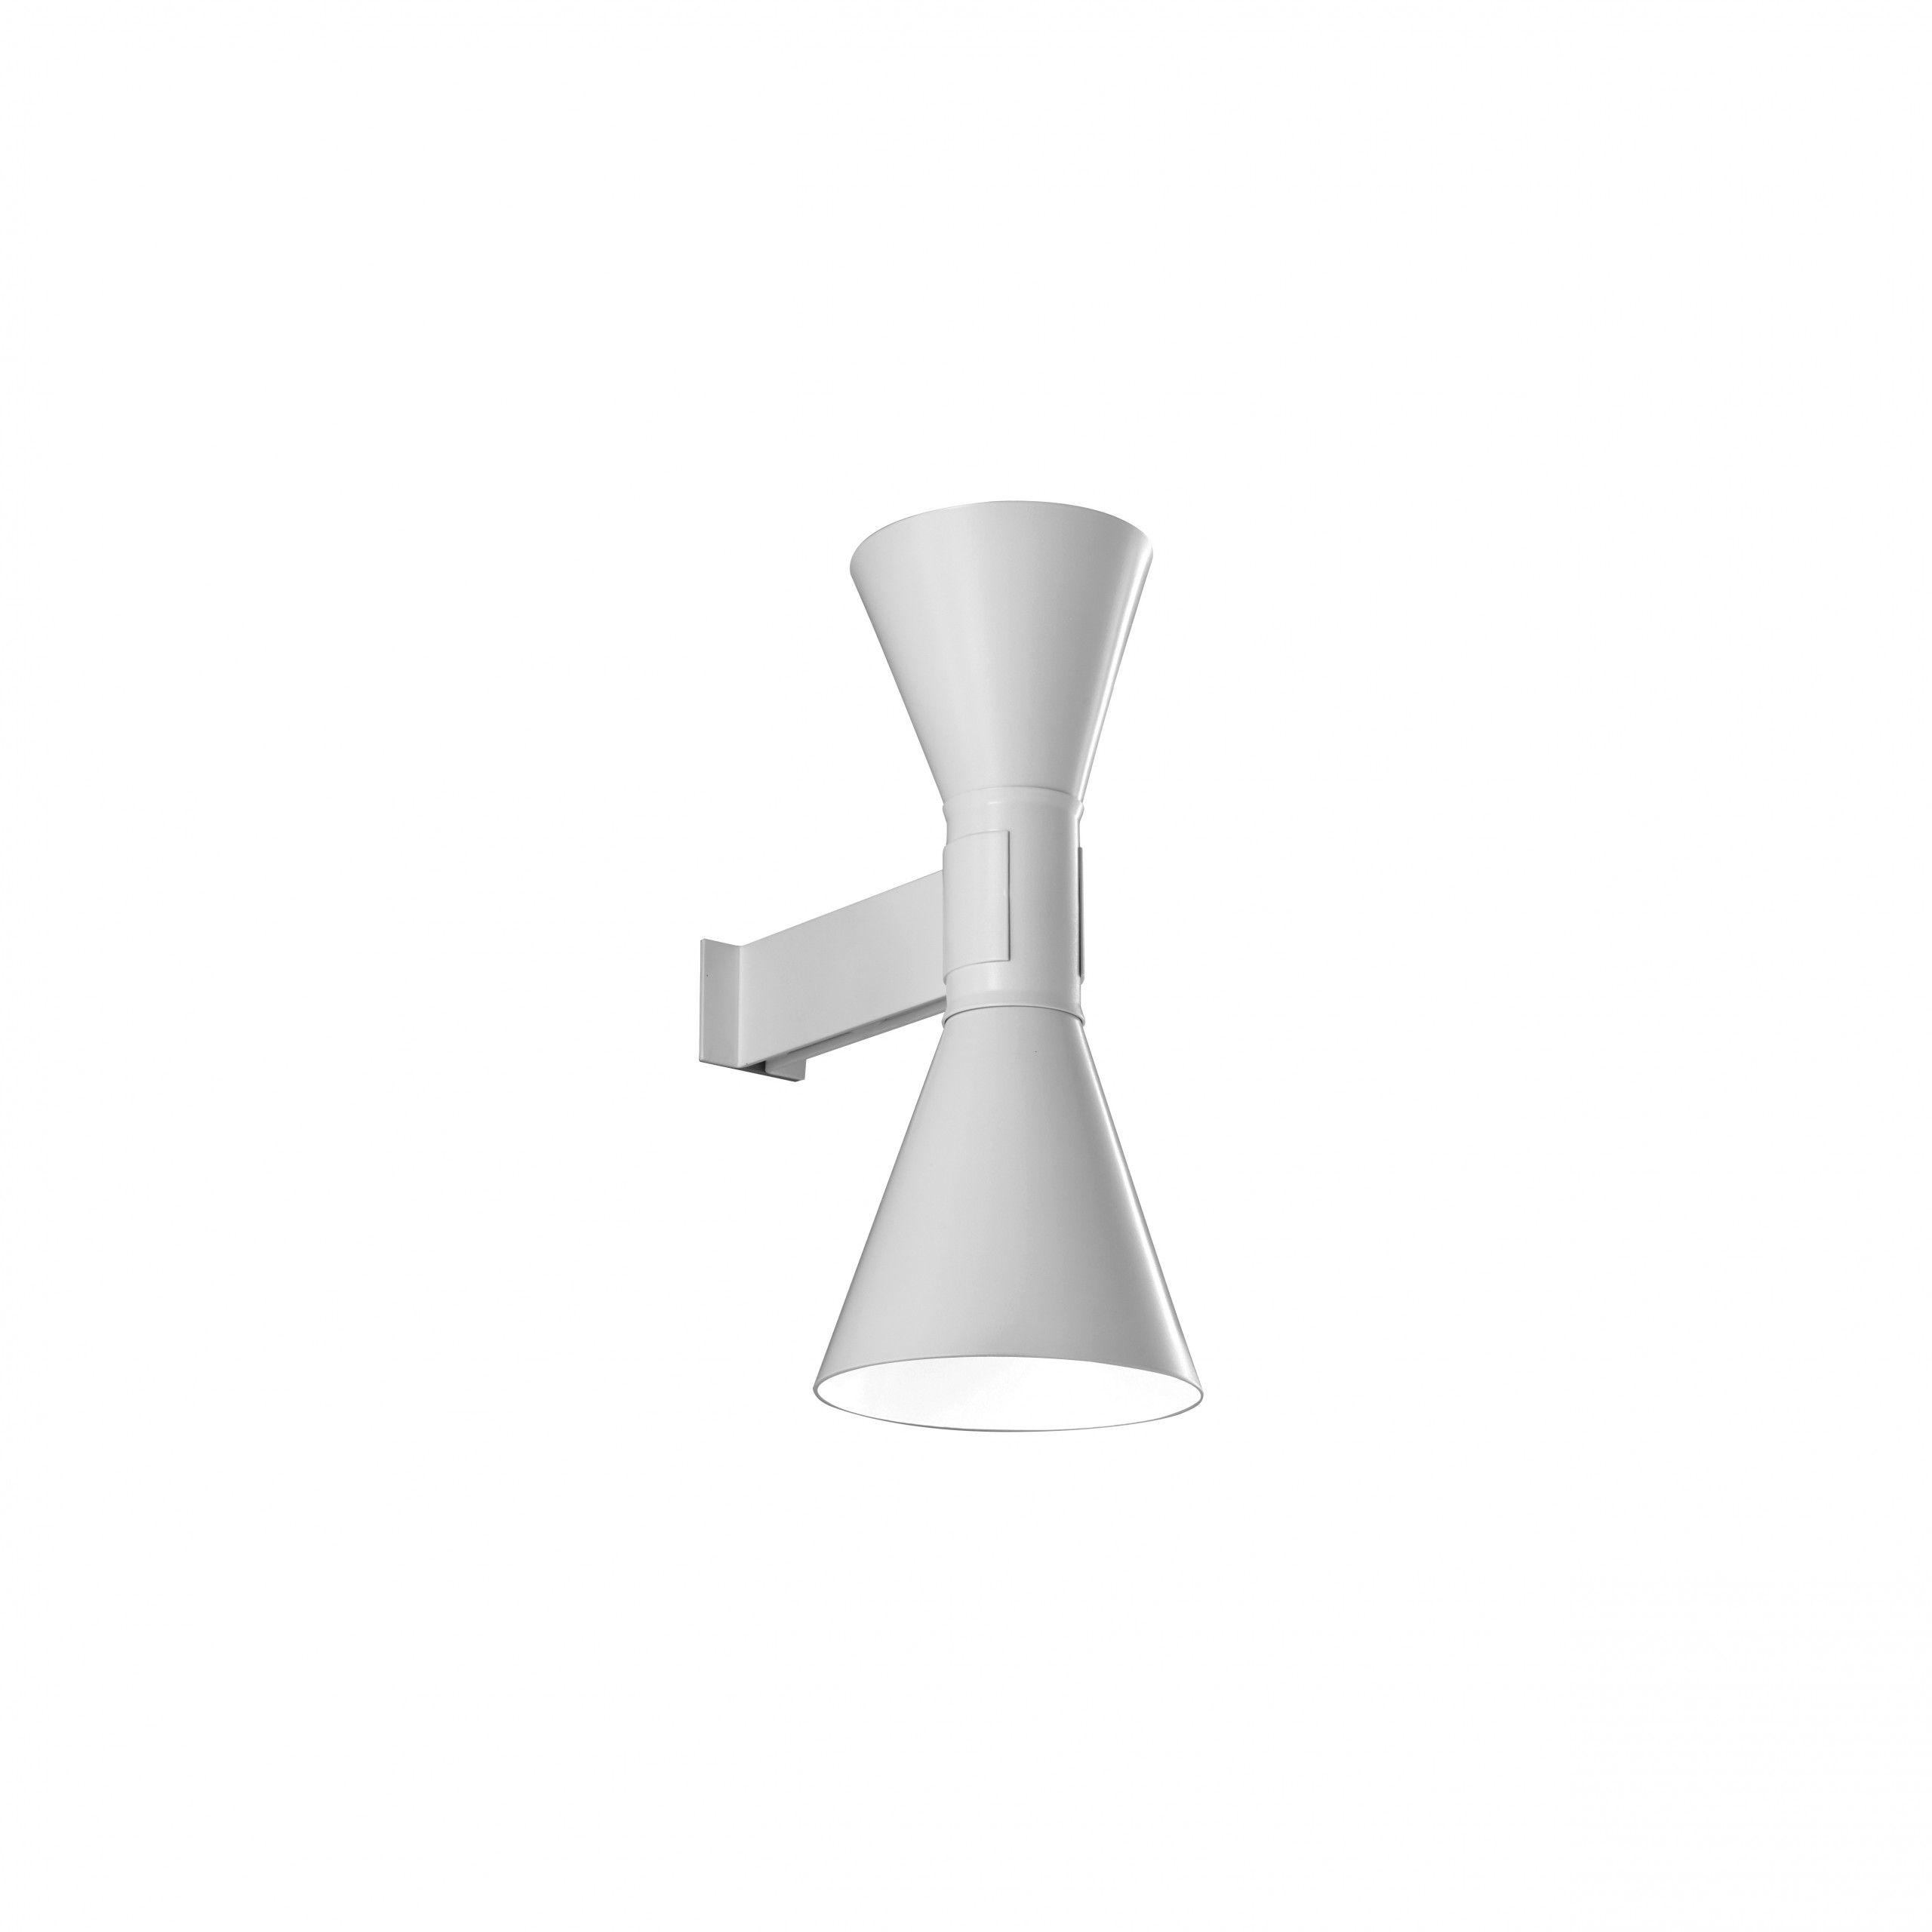 Applique de Marseille - Le Corbusier designed the Applique de Marseille for his Paris apartment at Rue Nungesser et Coli. Wall lamp, double emission, in aluminum painted matt grey, matt white or black, with white internal diffusers.  | Matter of Stuff